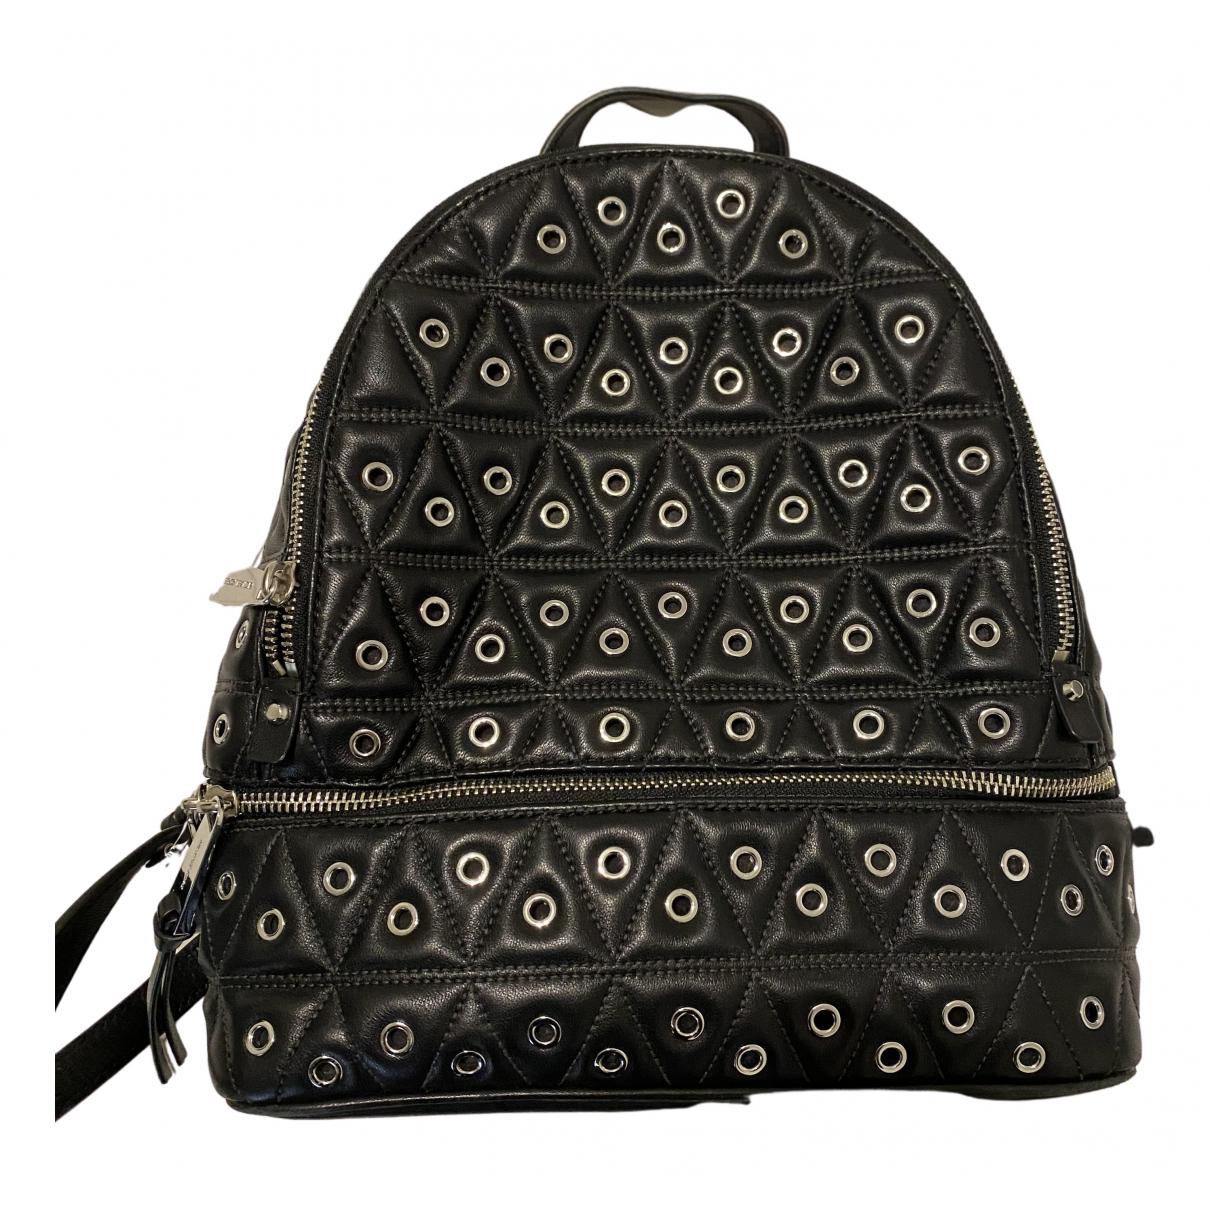 Michael Kors Rhea Black Leather backpack for Women N